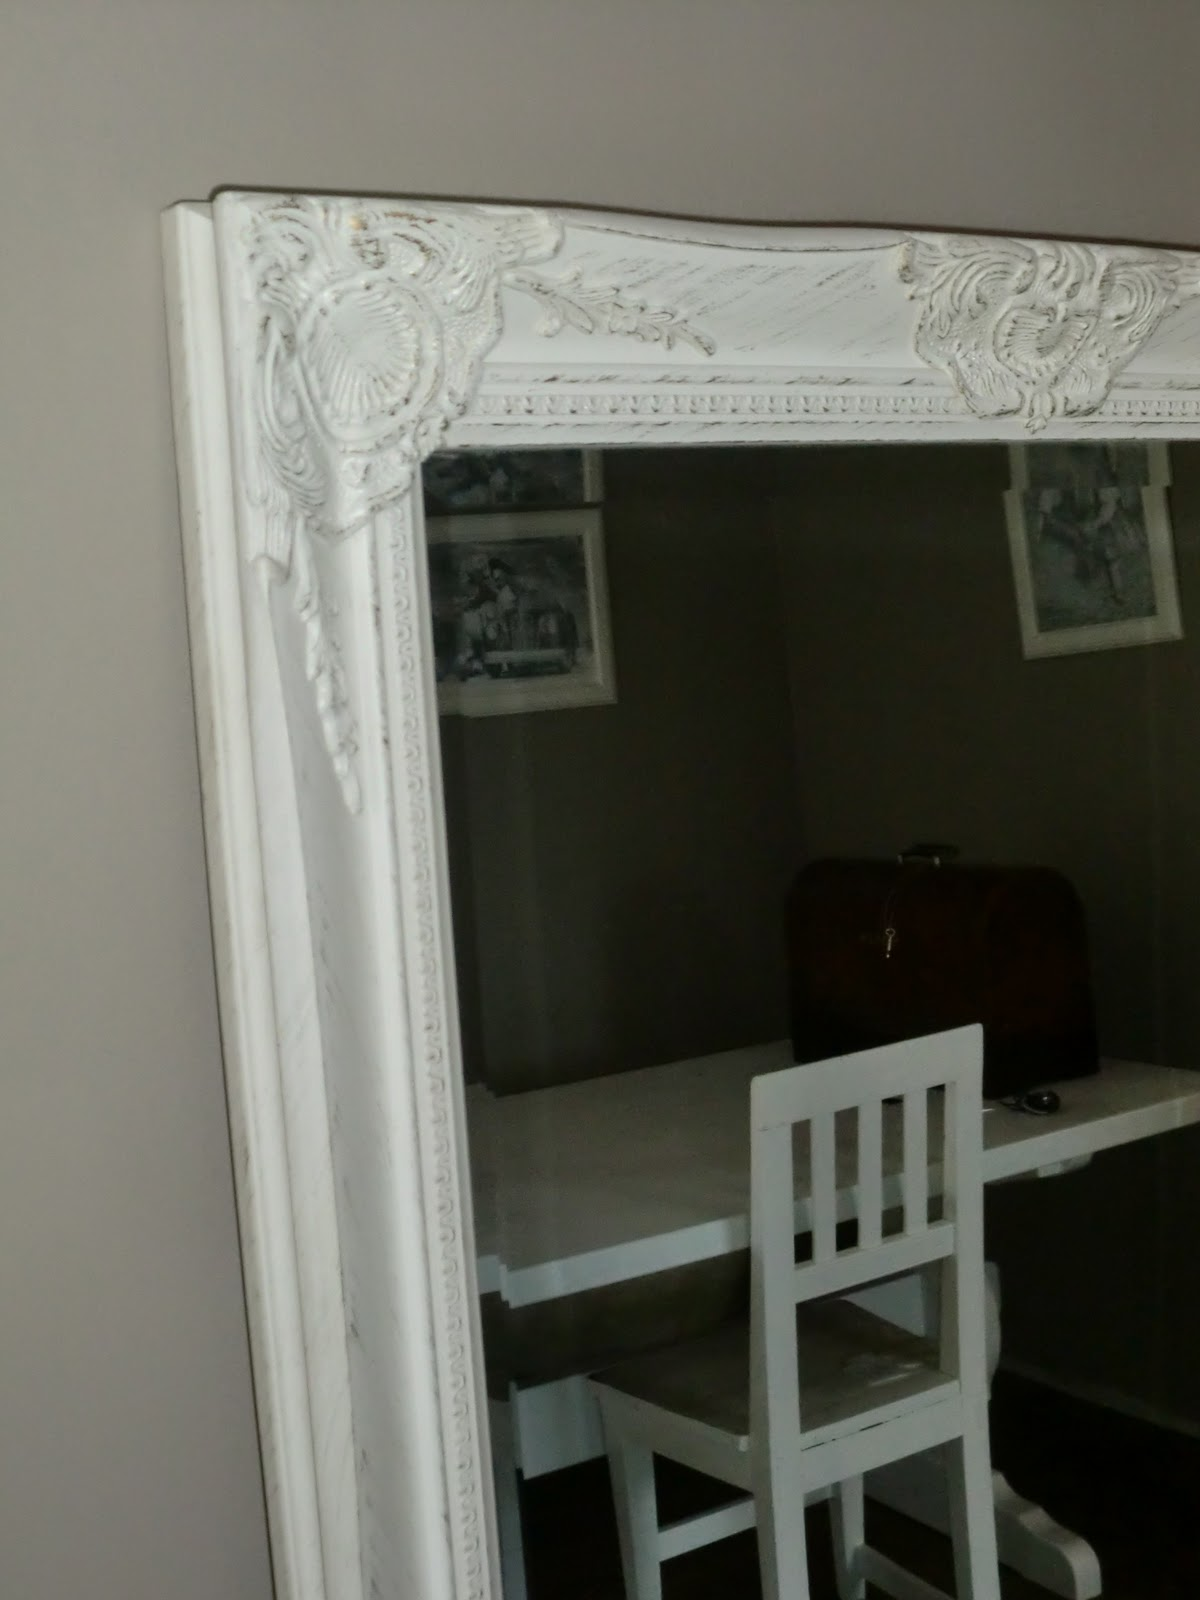 v?rt lune hi: speil speil p? veggen der..